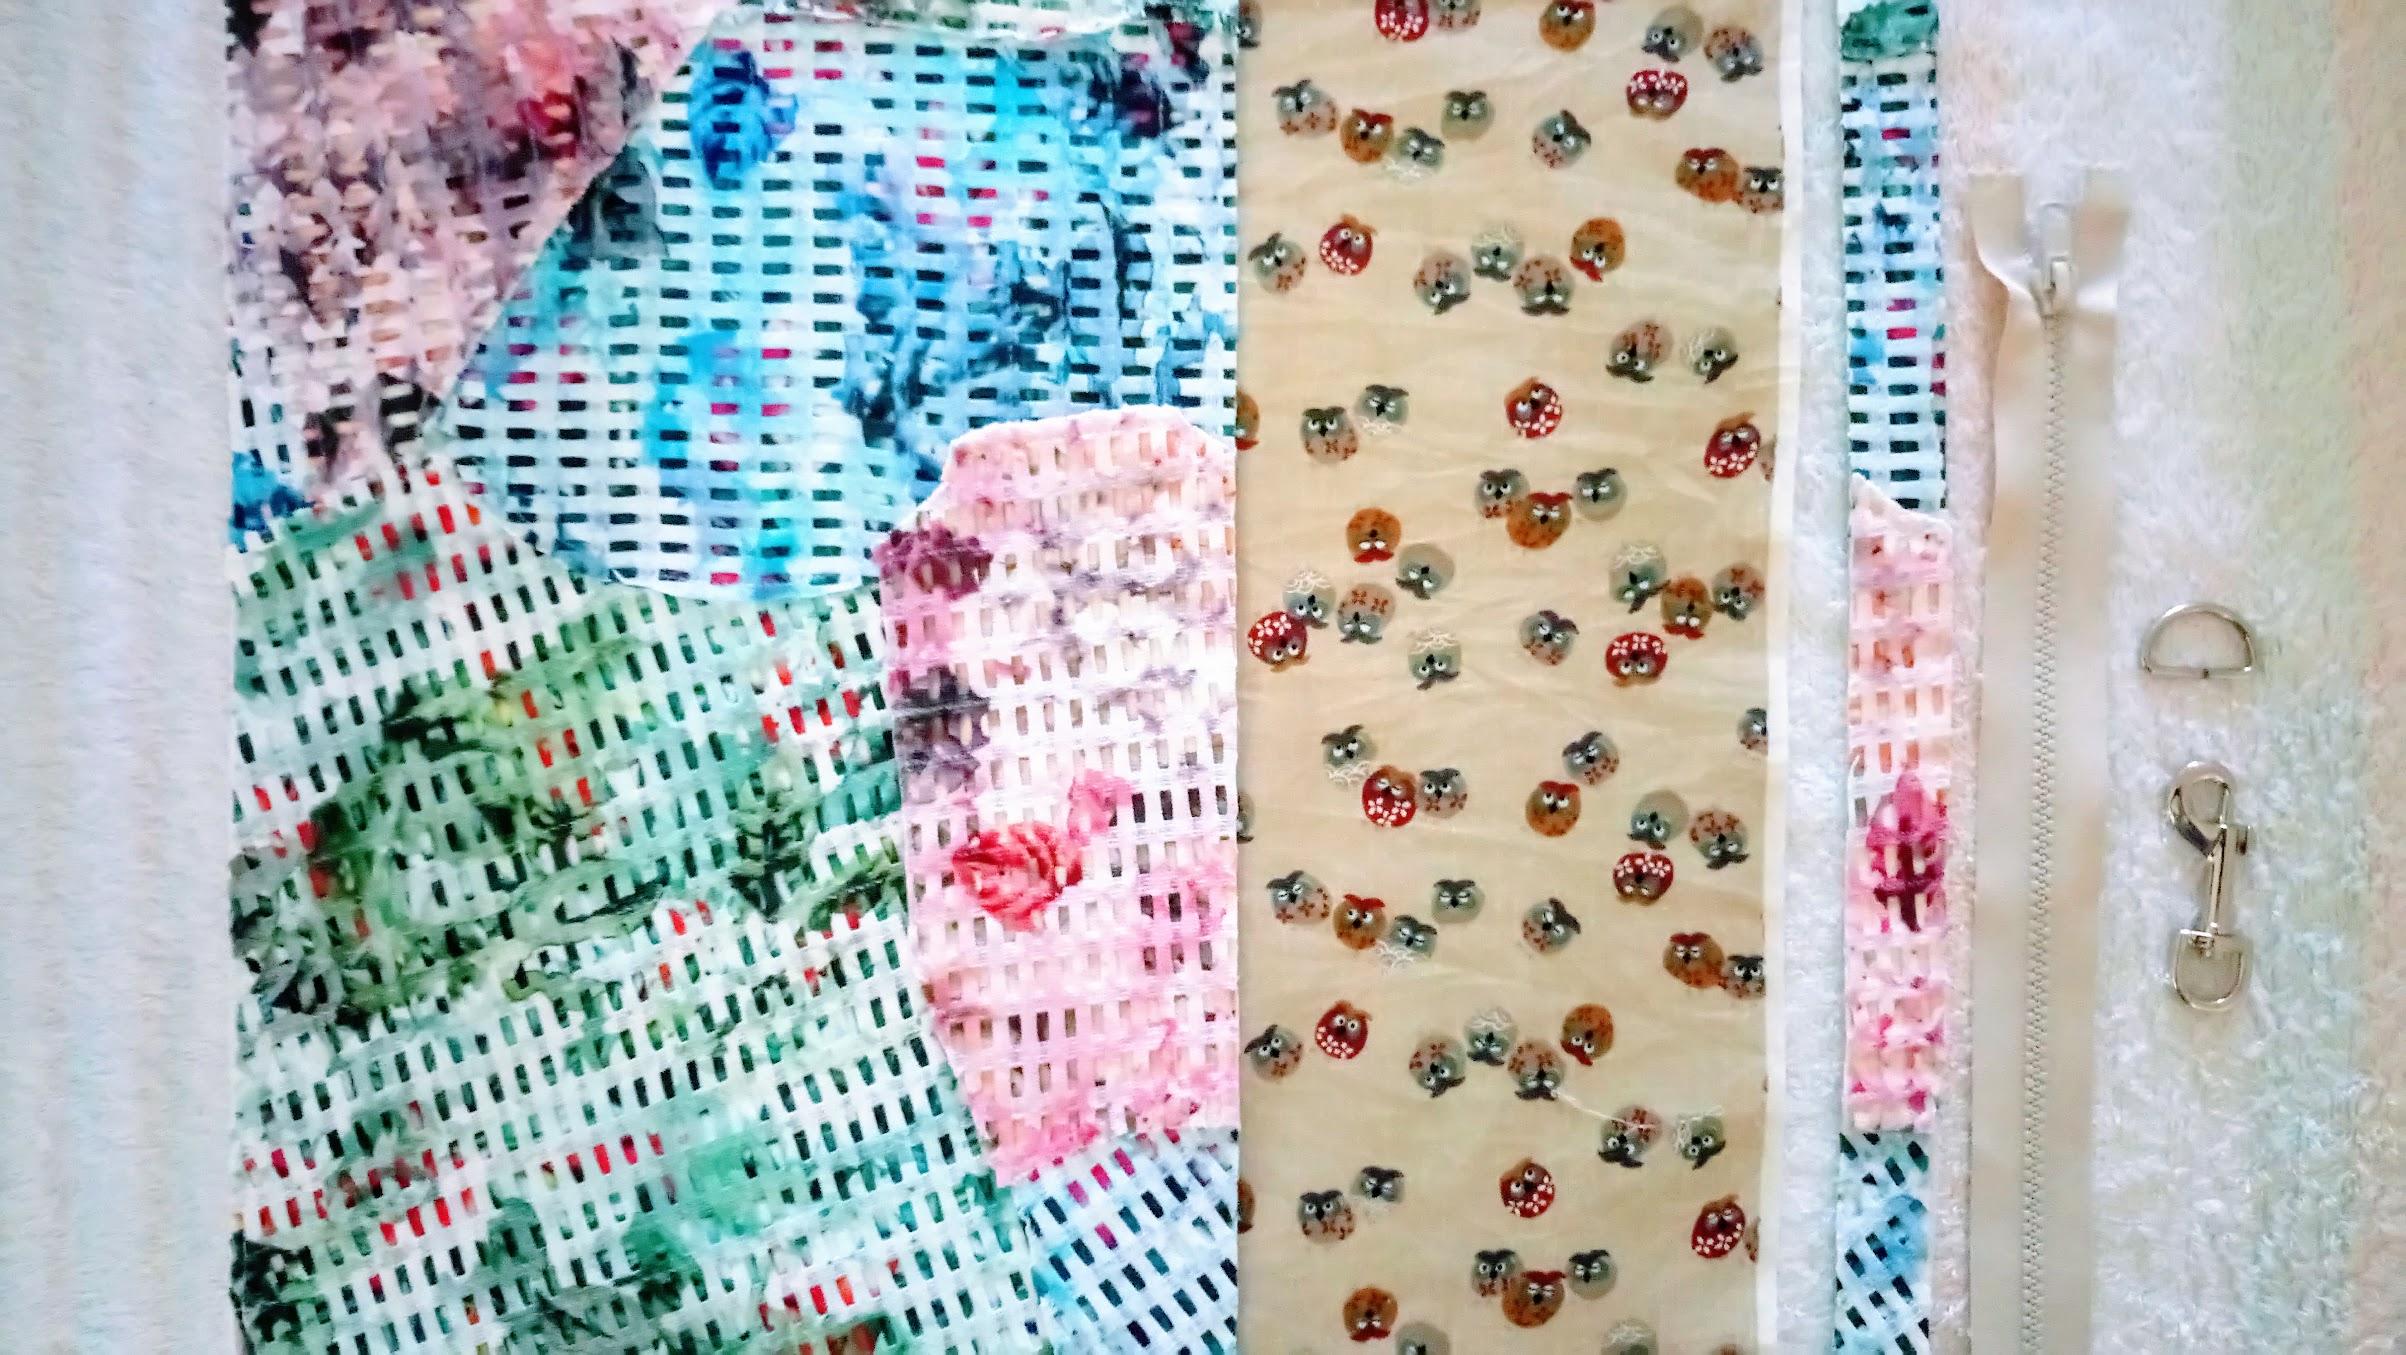 Materials: DIY Fabric Collage Tetrahedron Bag - DIY Fashion Accessories   fafafoom.com